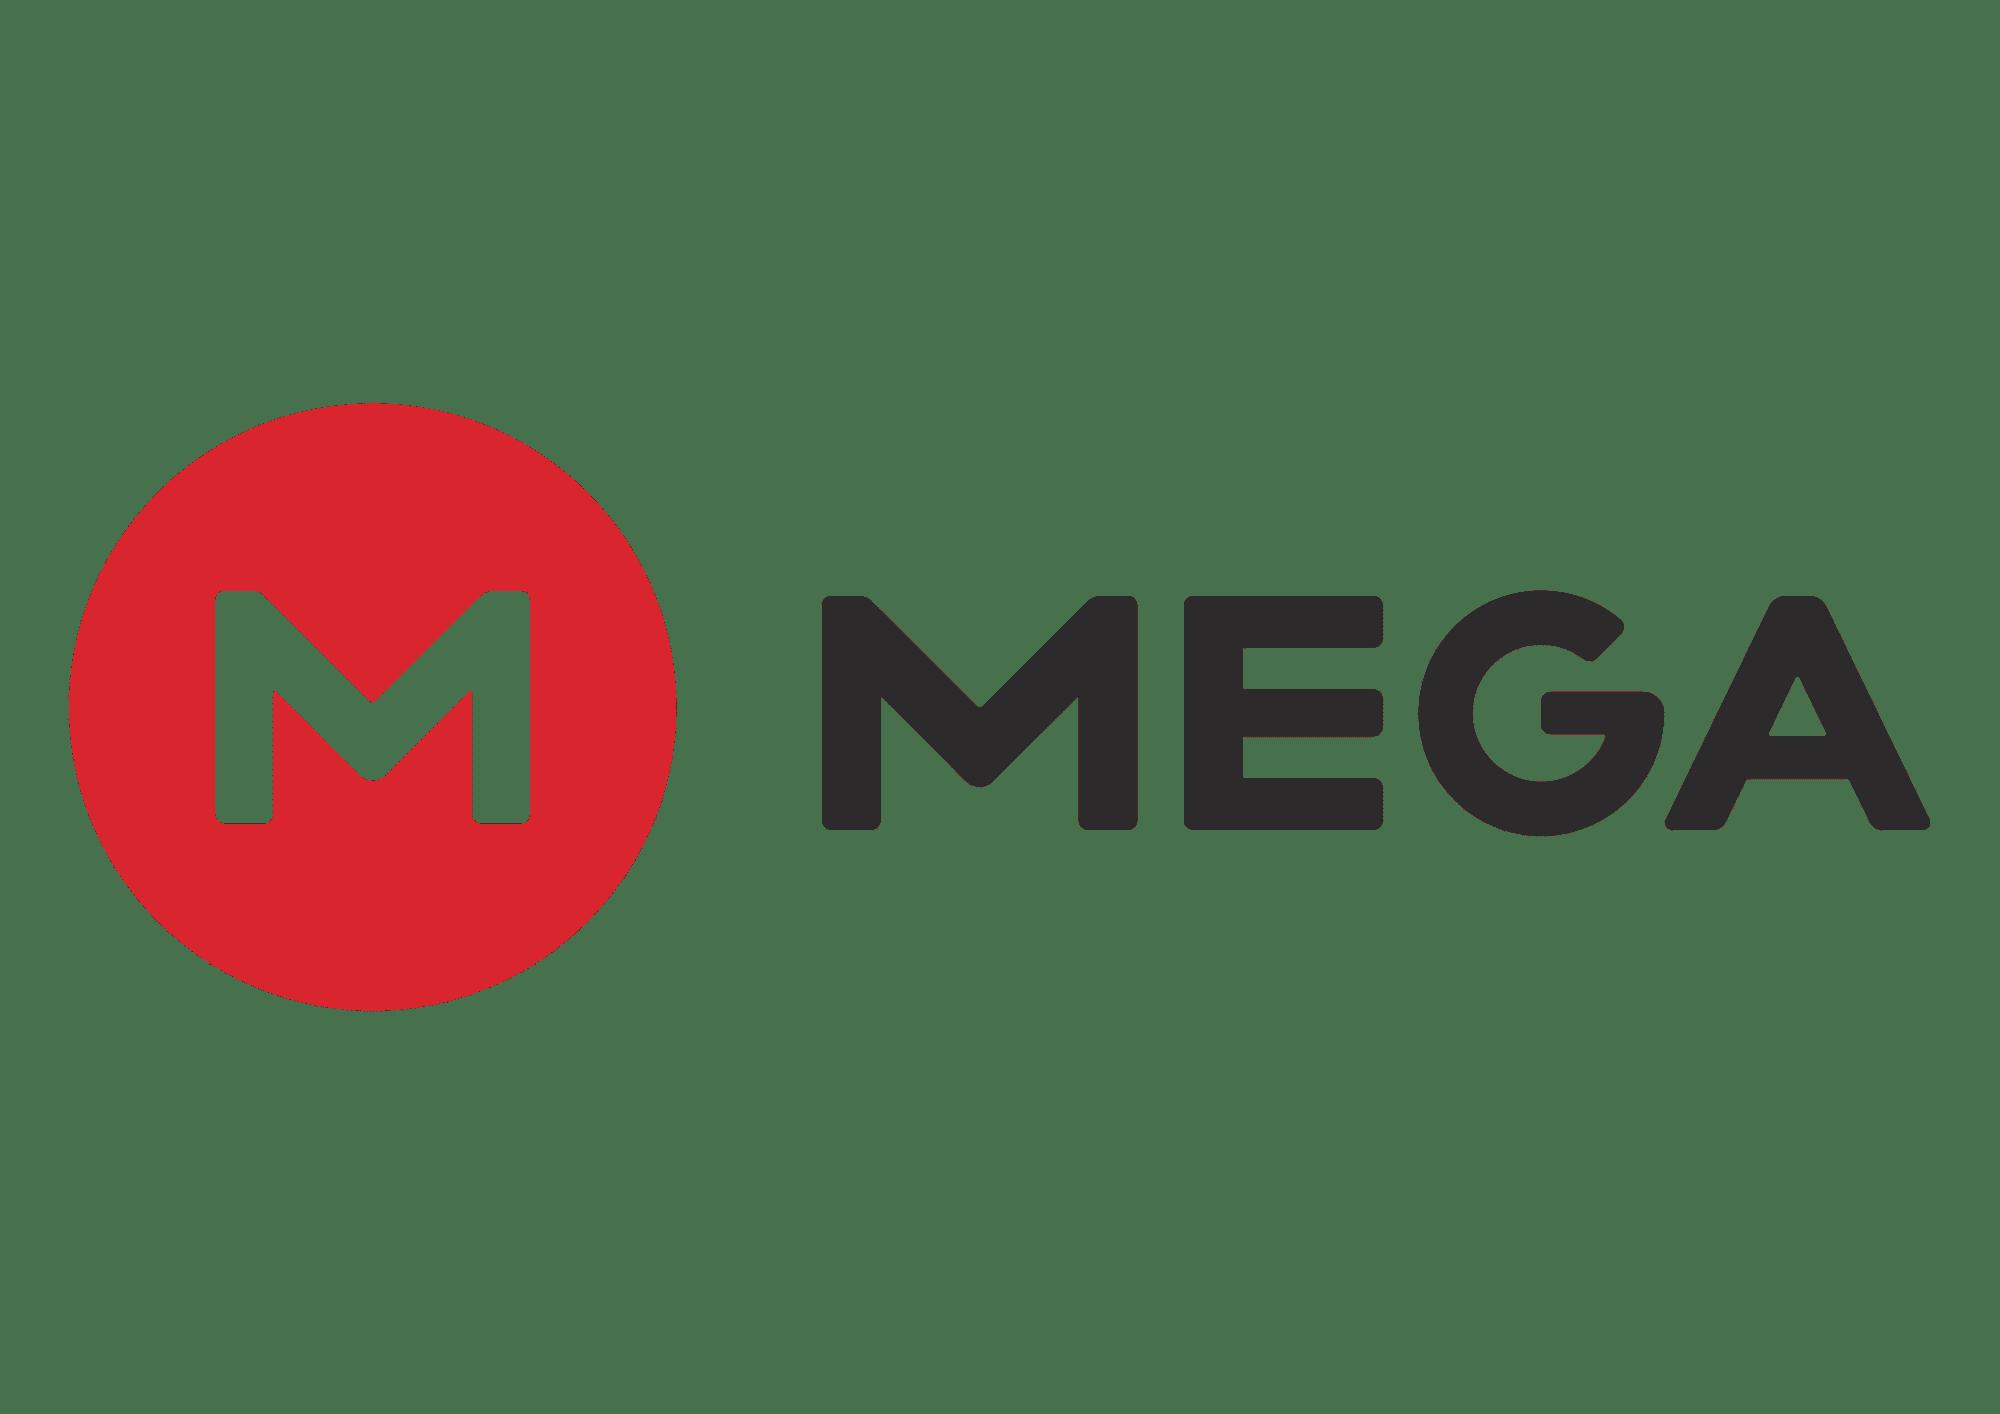 mega-logo-png